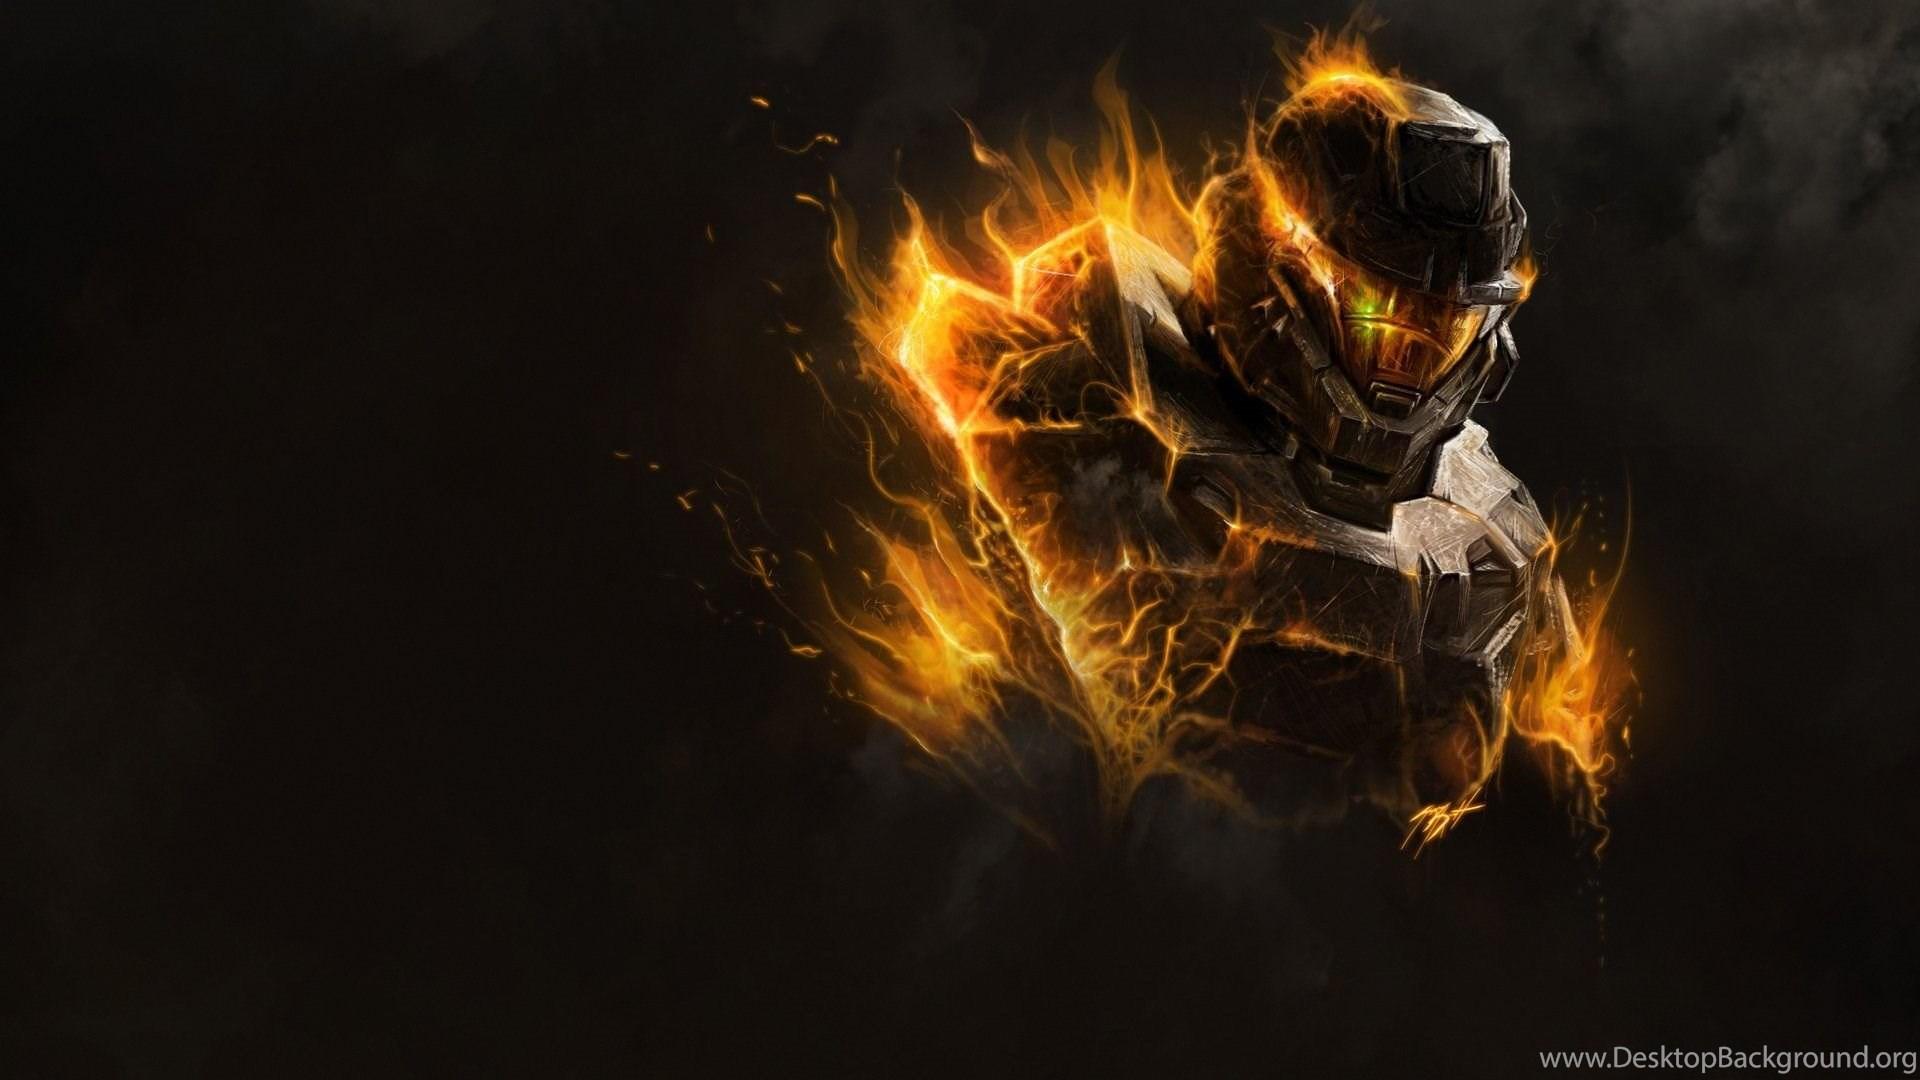 Halo 5 Guardians Wallpapers Desktop Background